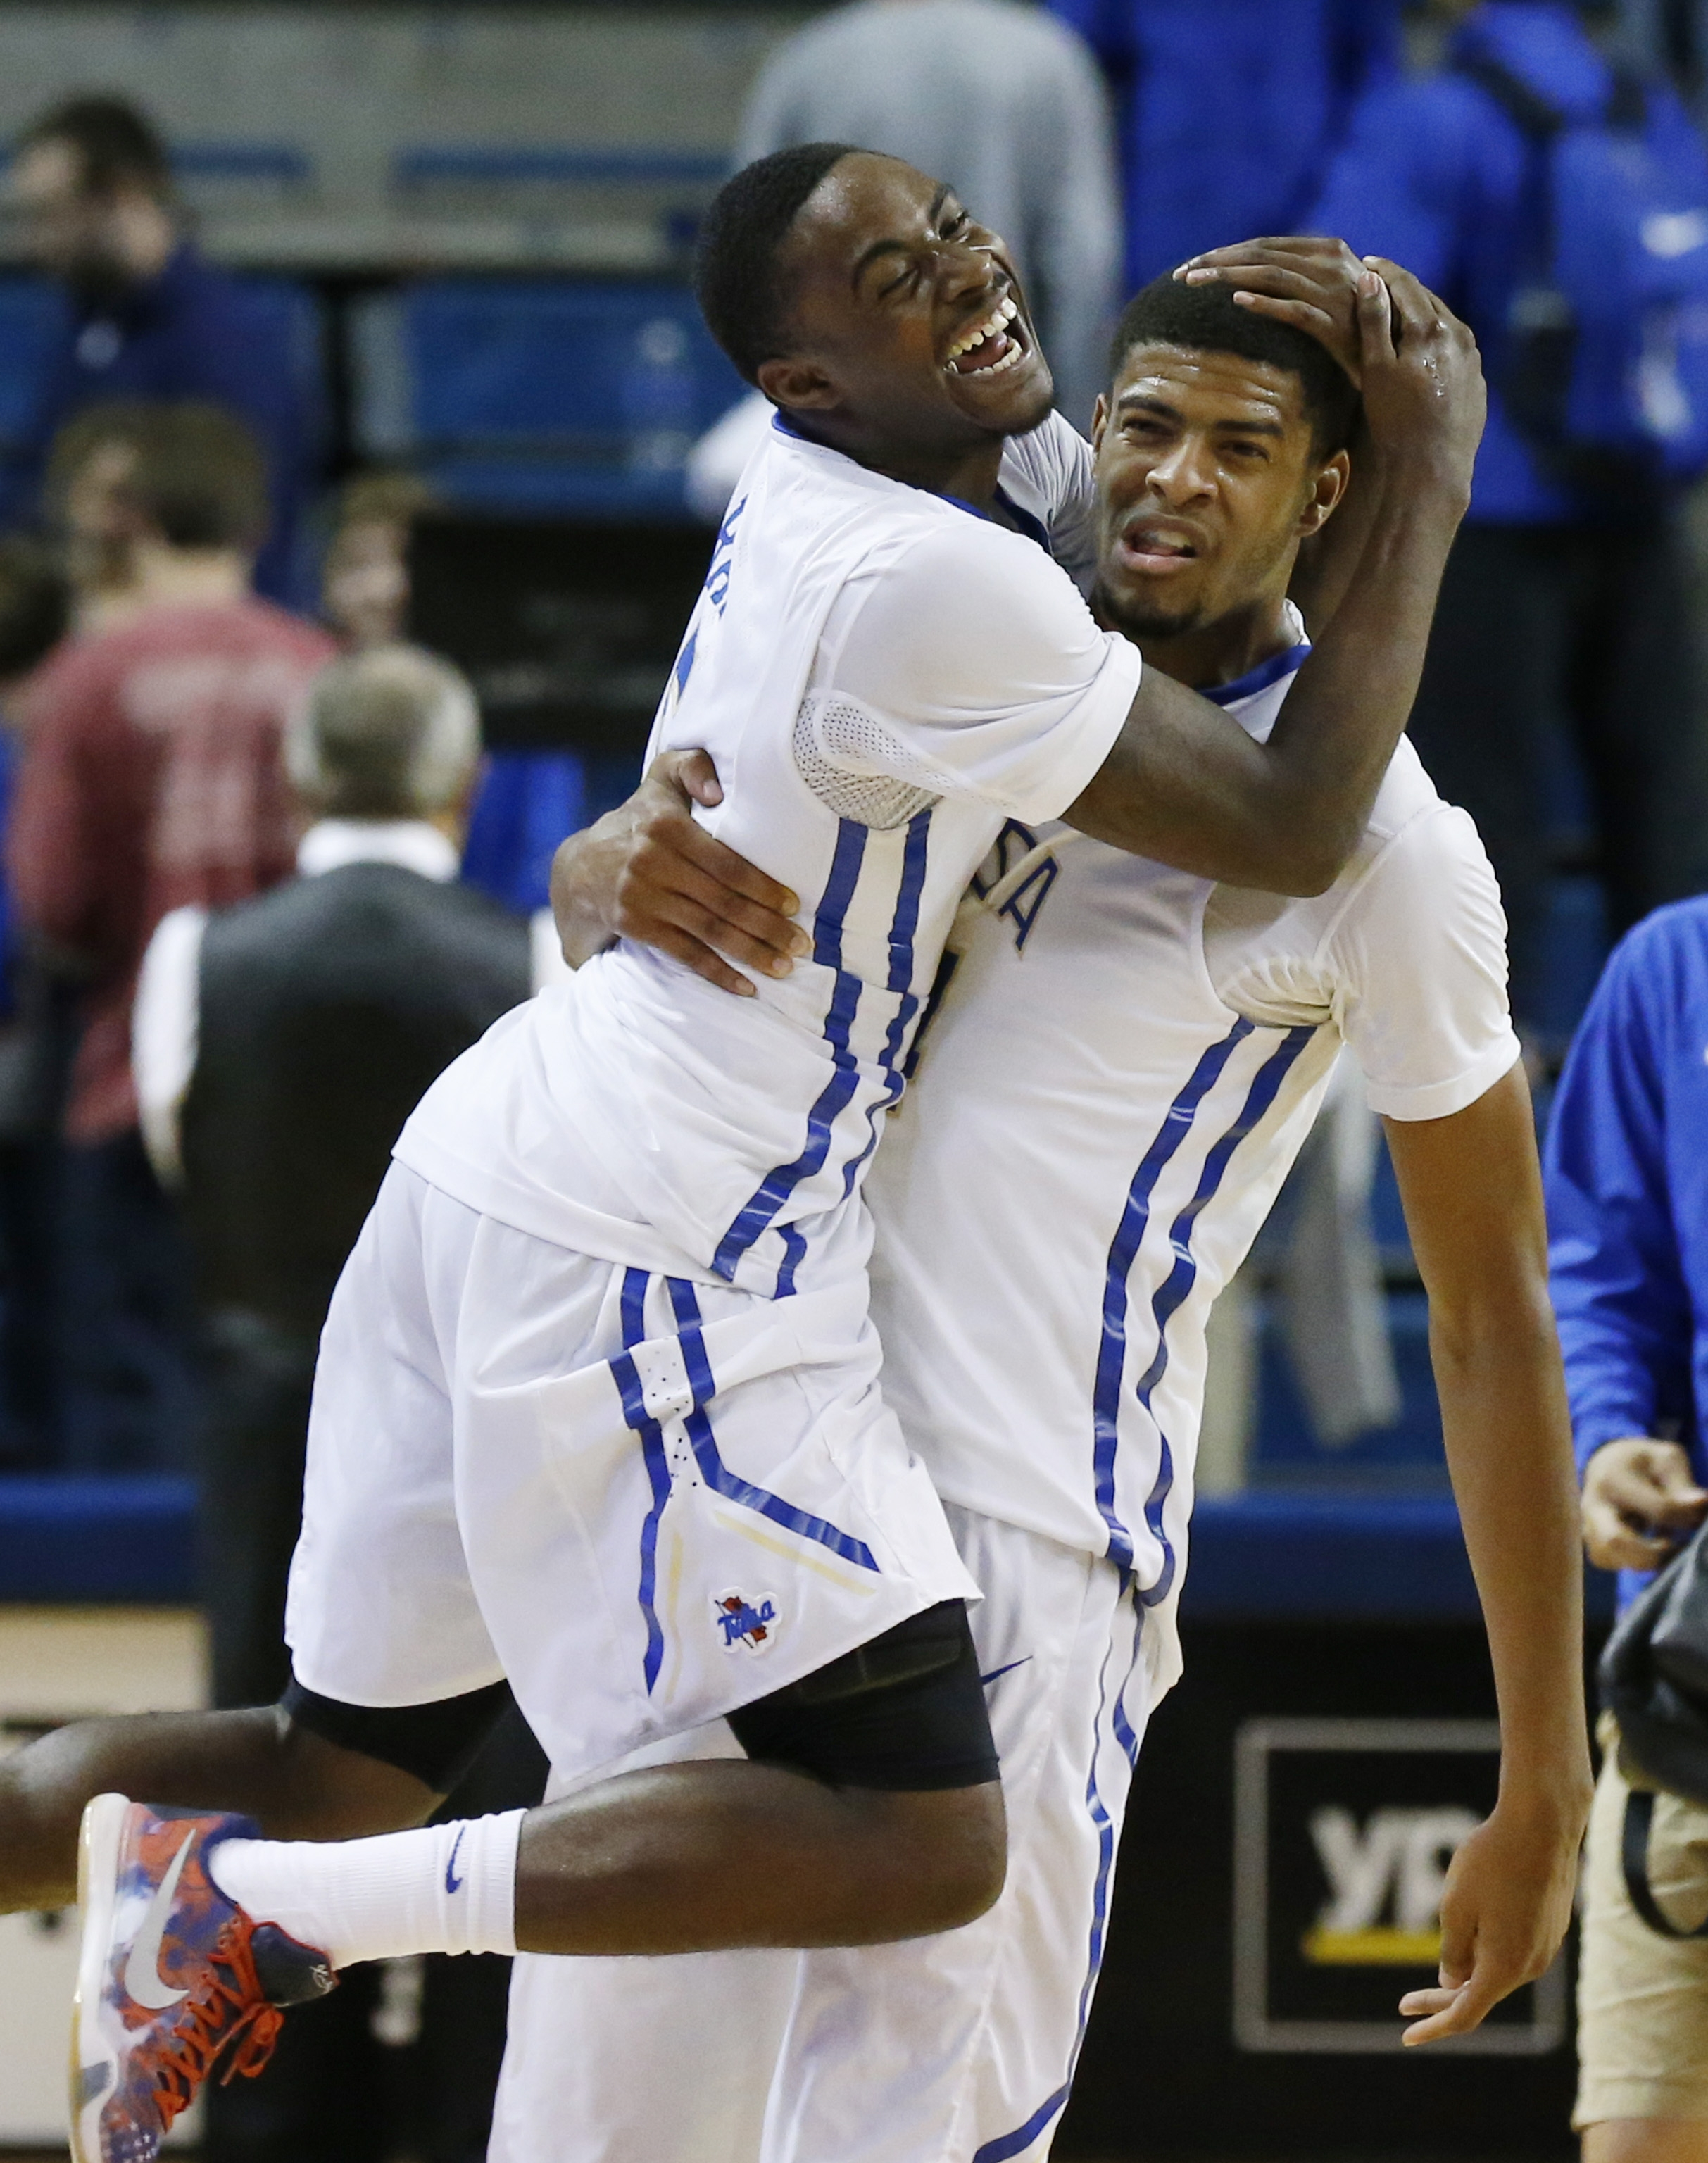 Tulsa's Rashad Ray, left, and Brandon Swannegan, right, celebrate after an NCAA college basketball game against Wichita State in Tulsa, Okla., Tuesday, Nov. 17, 2015. Tulsa won 77-67. (AP Photo/Sue Ogrocki)